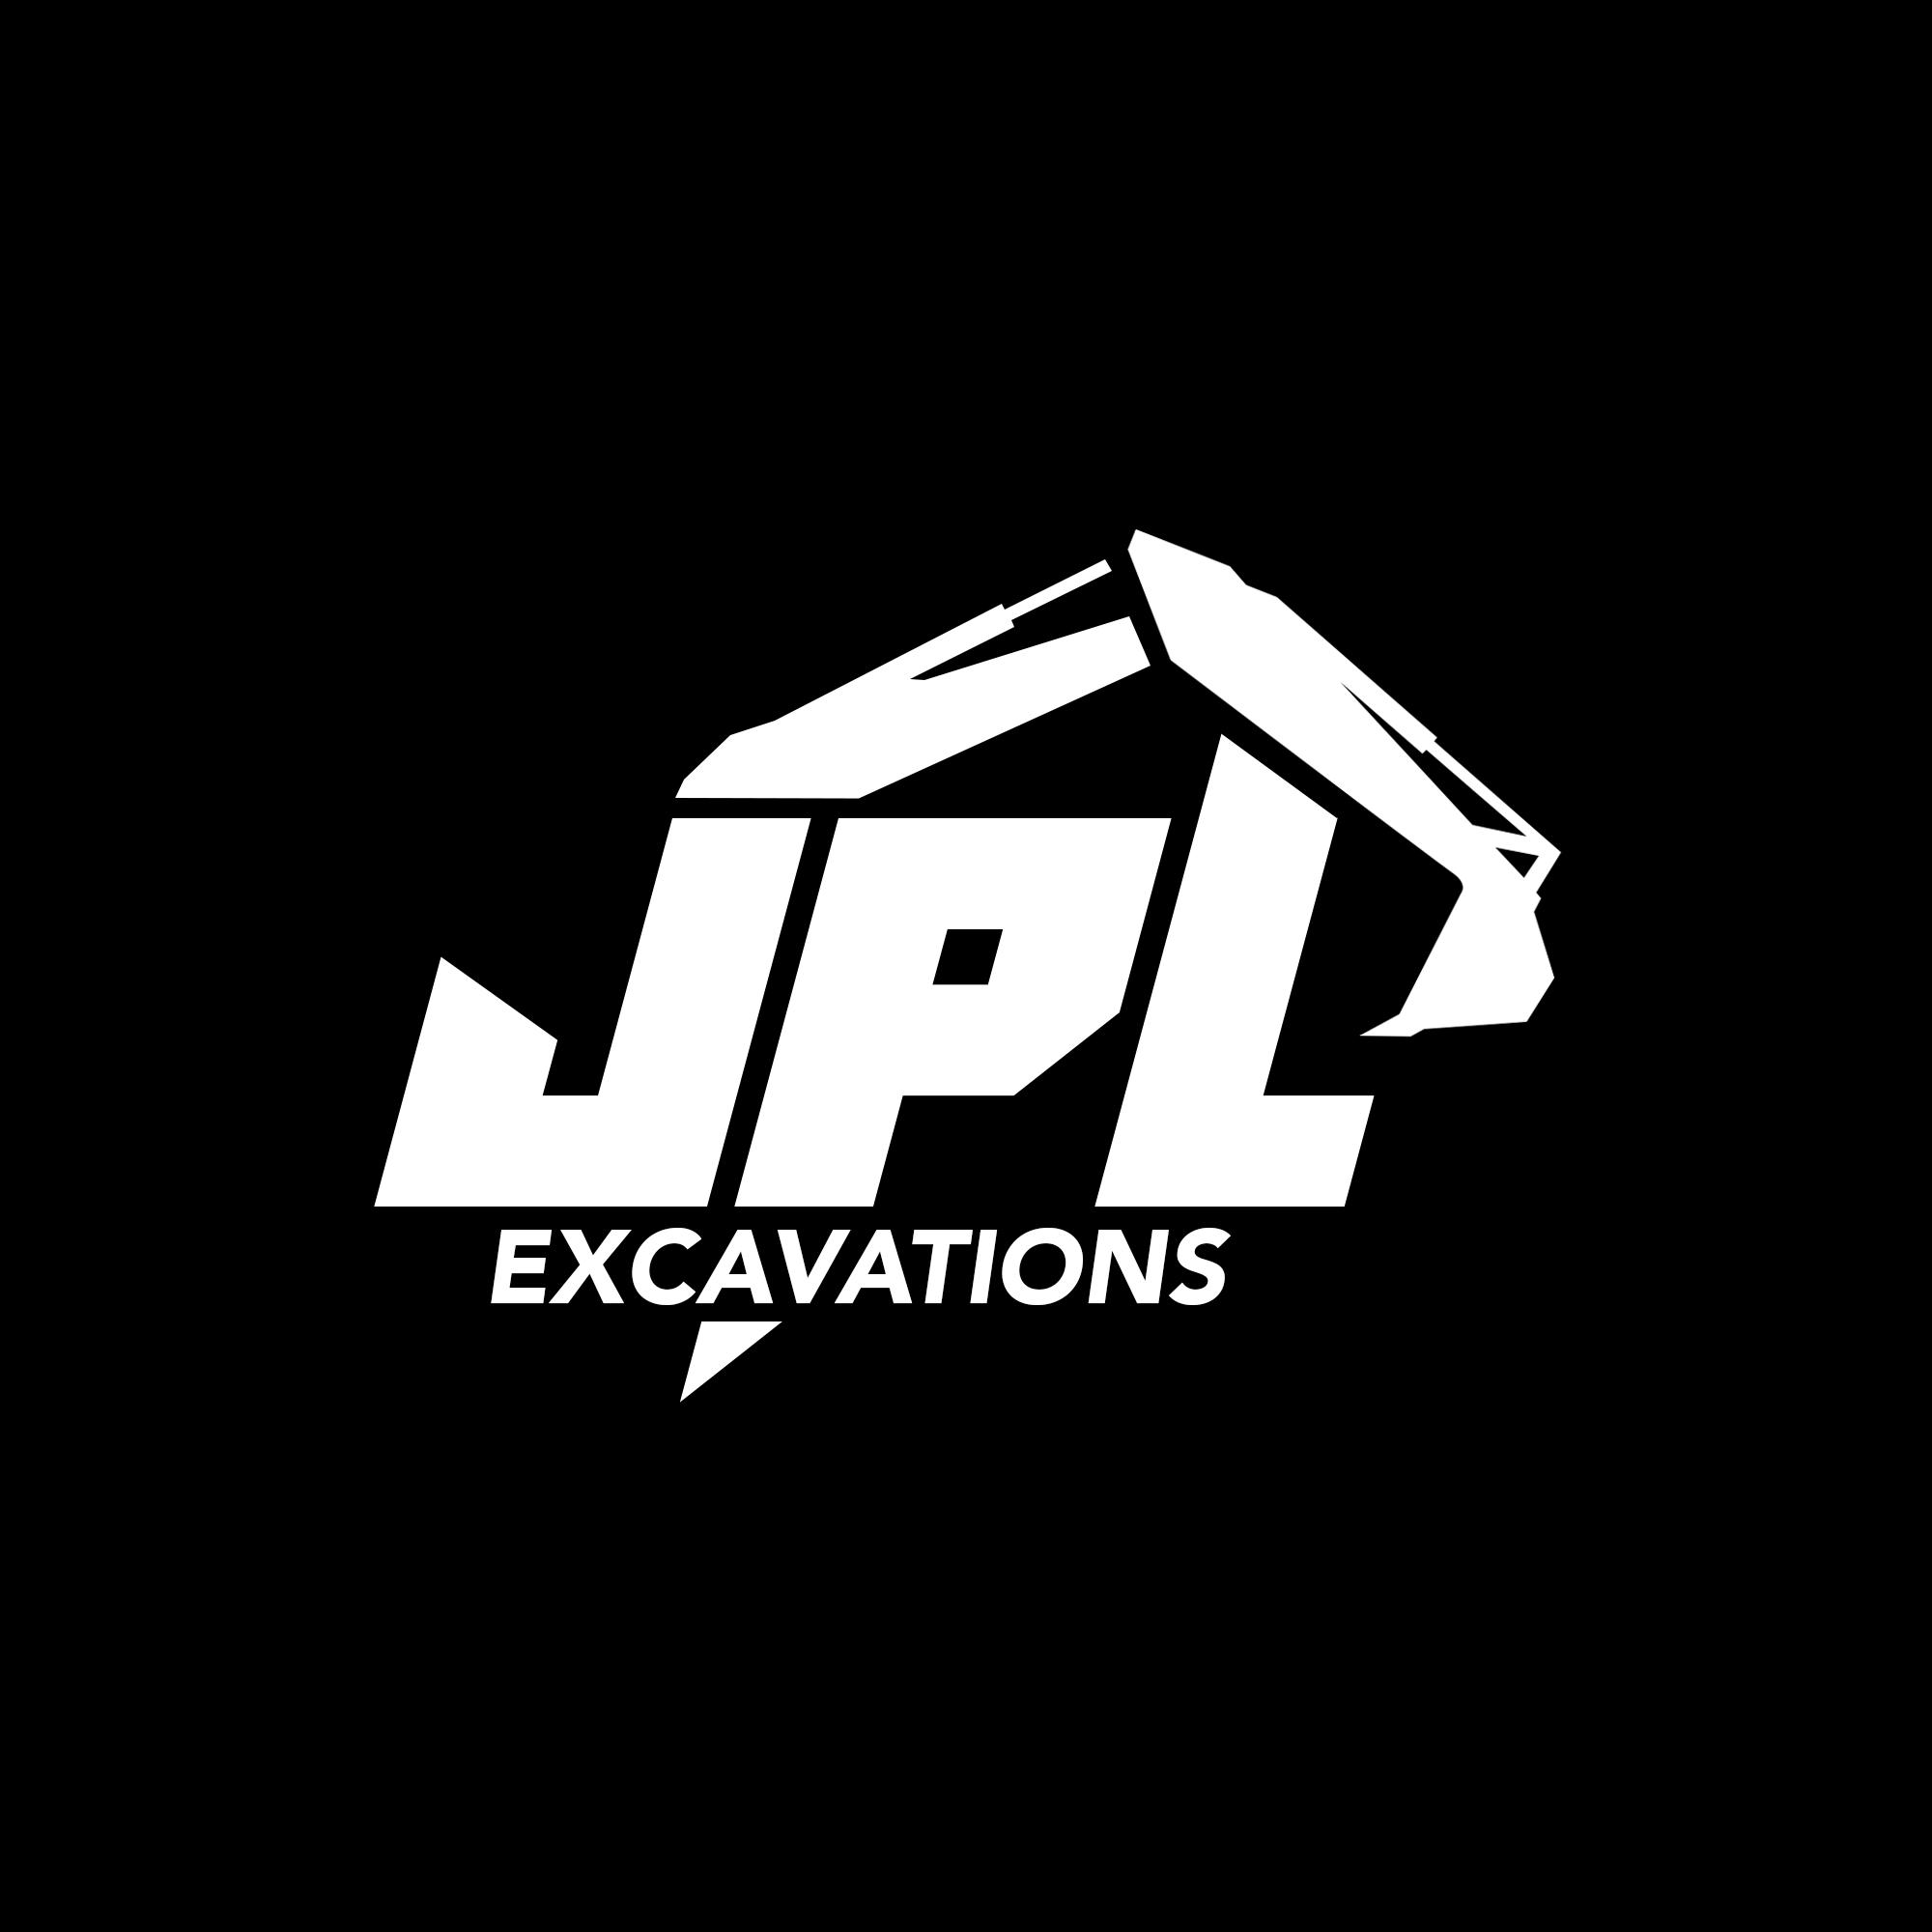 JPL Excavations